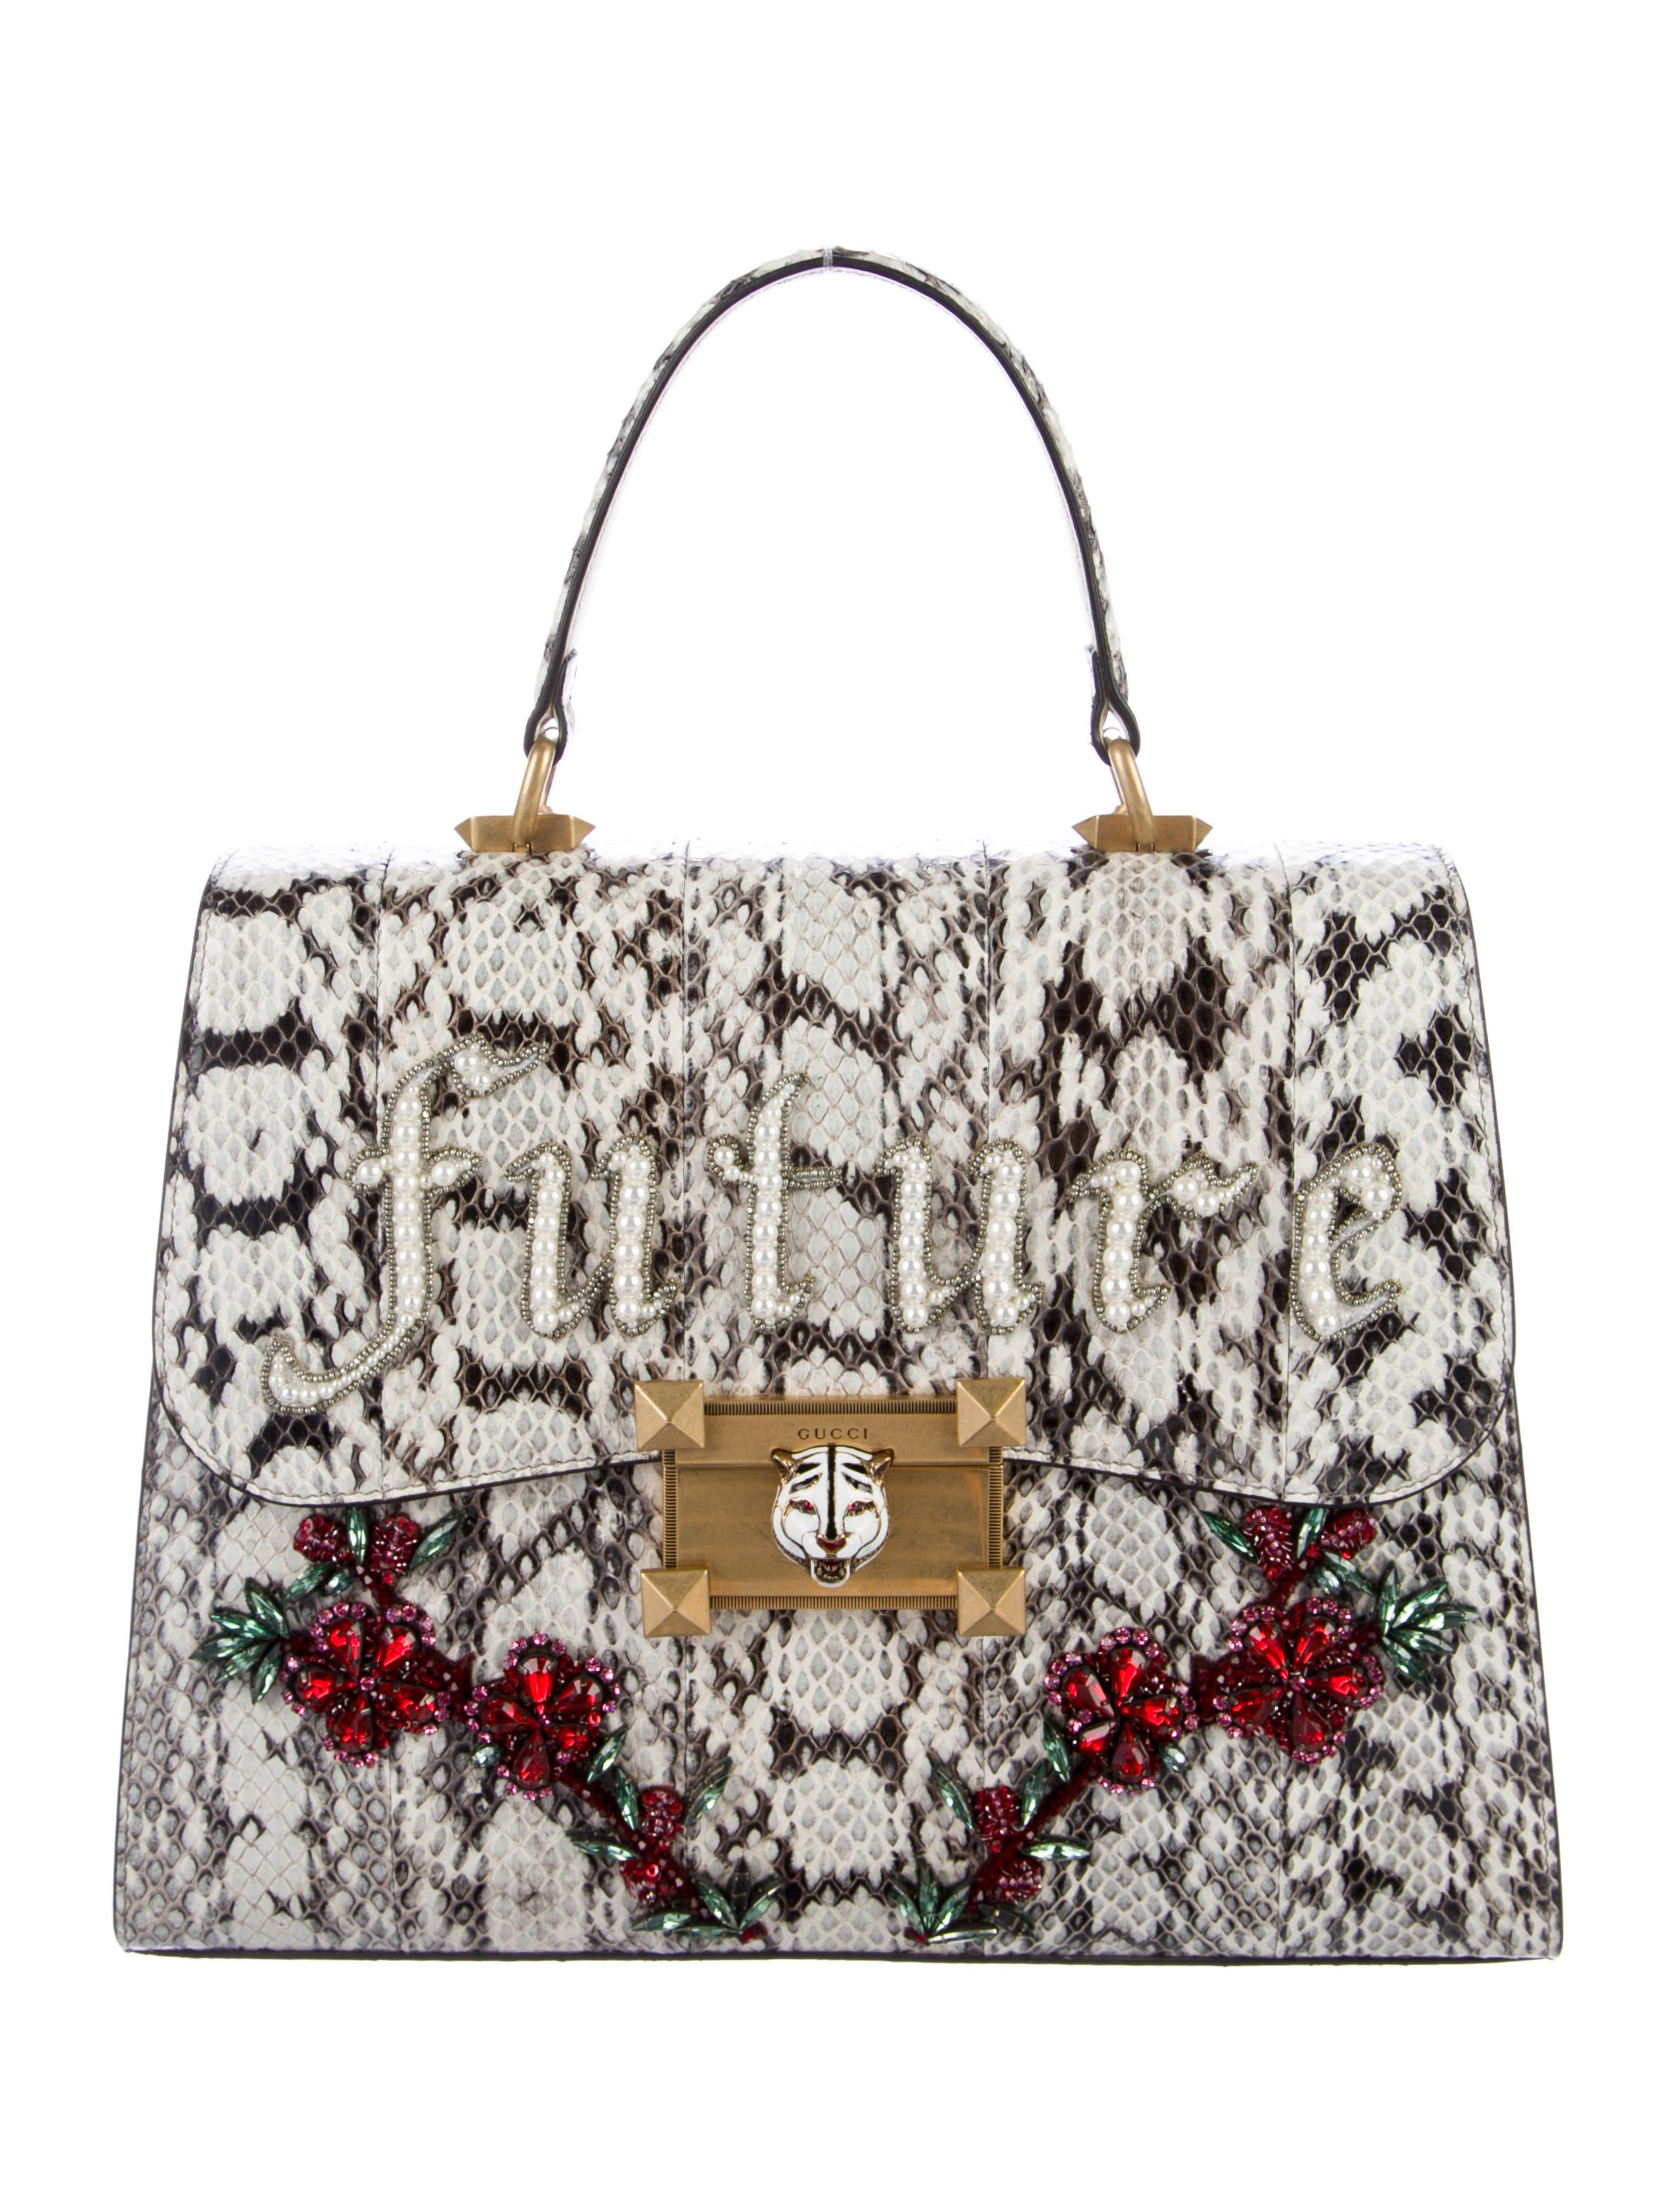 ac7914a5fc3 Gucci 2017 Osiride Future Snakeskin Medium Top Handle Bag - Handbags ...